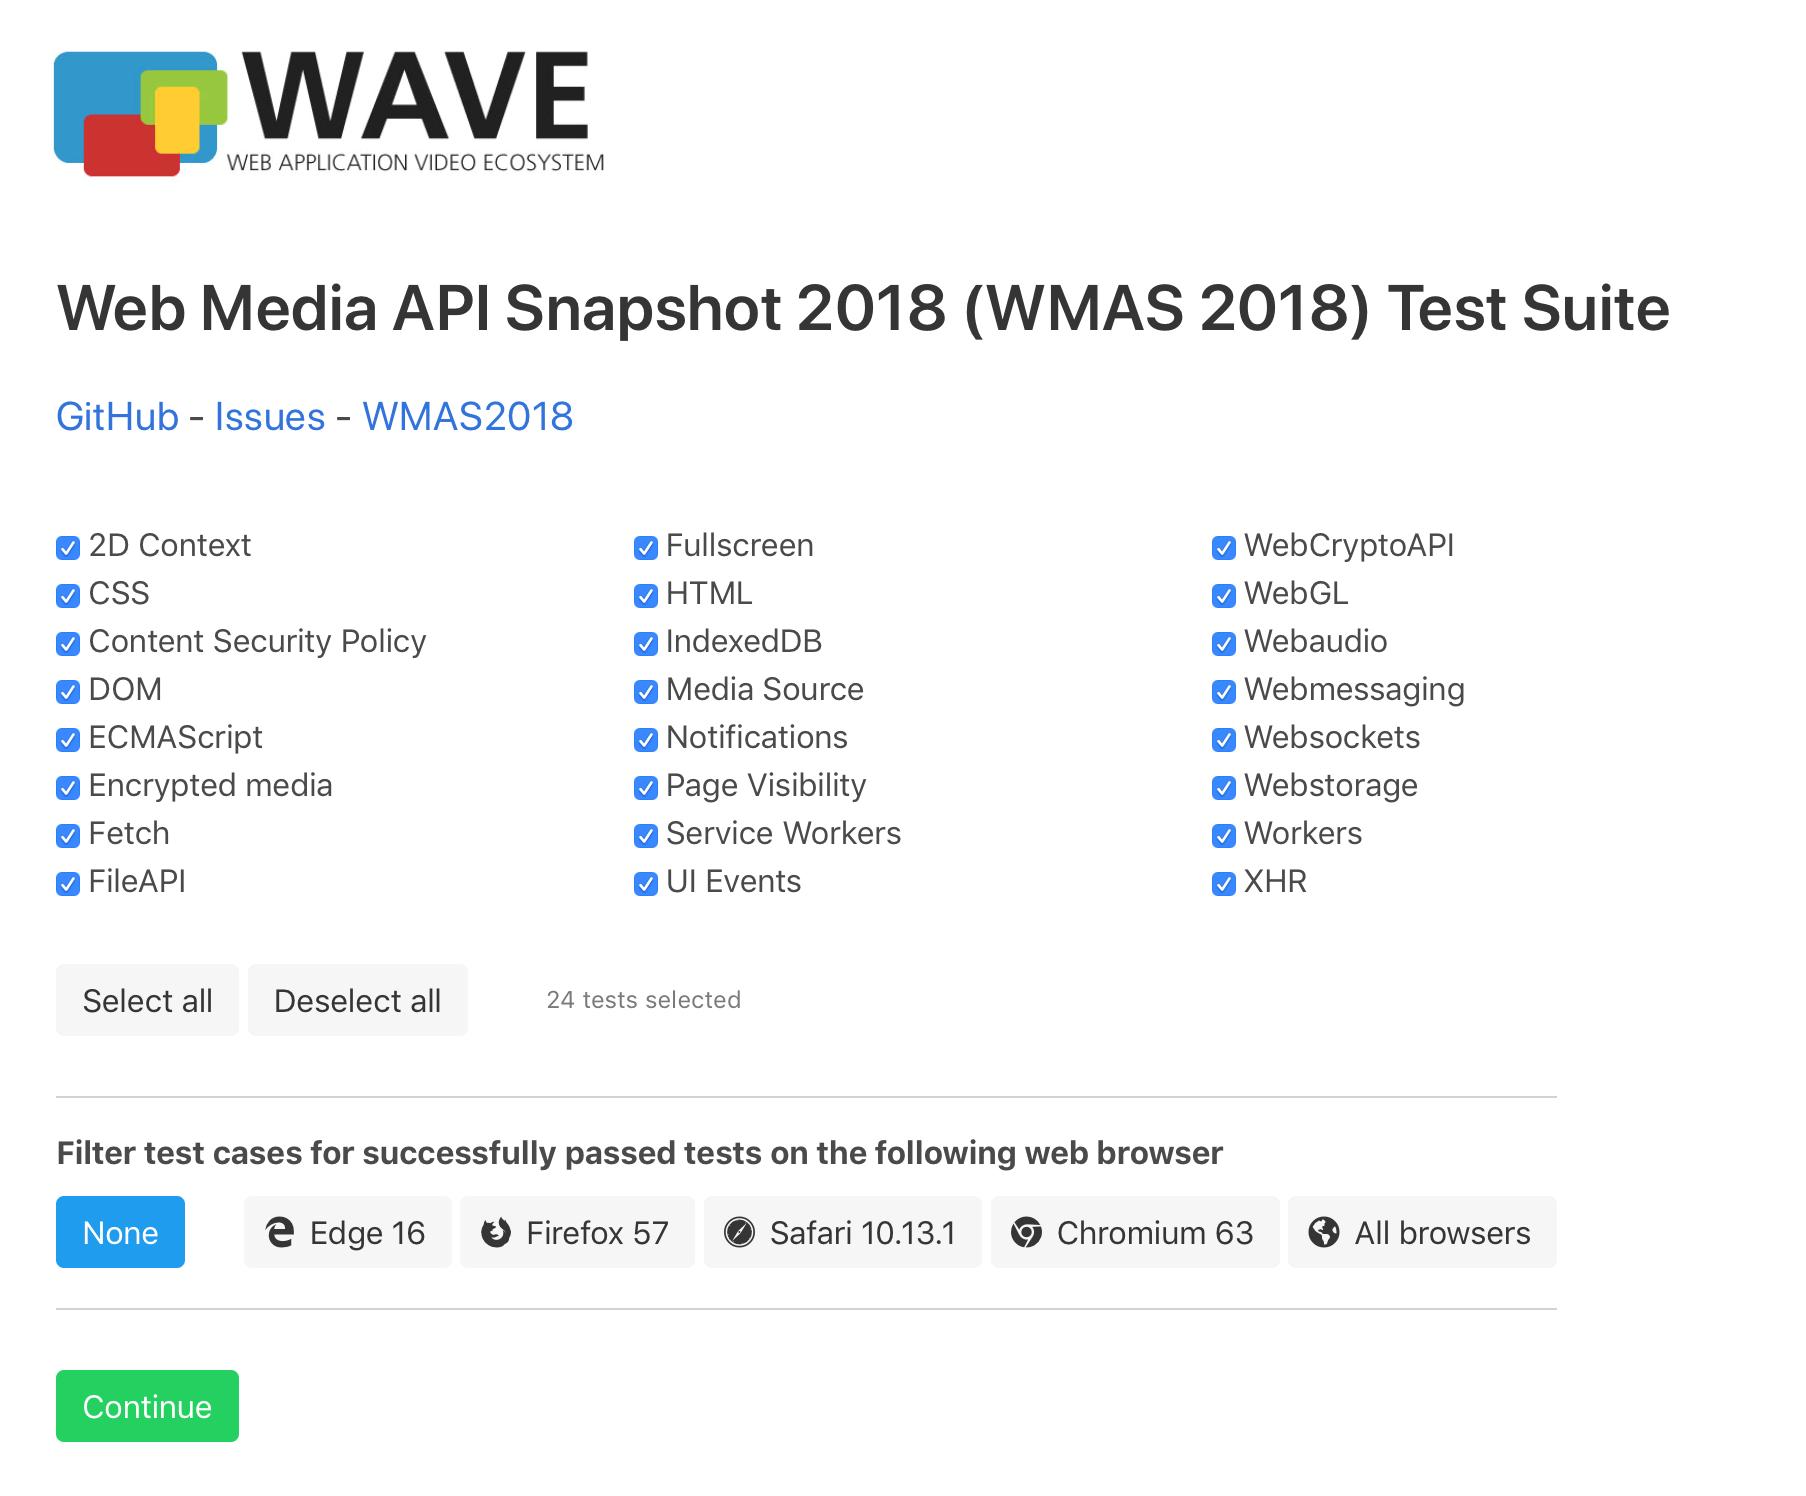 WMATS2018 Landing Page